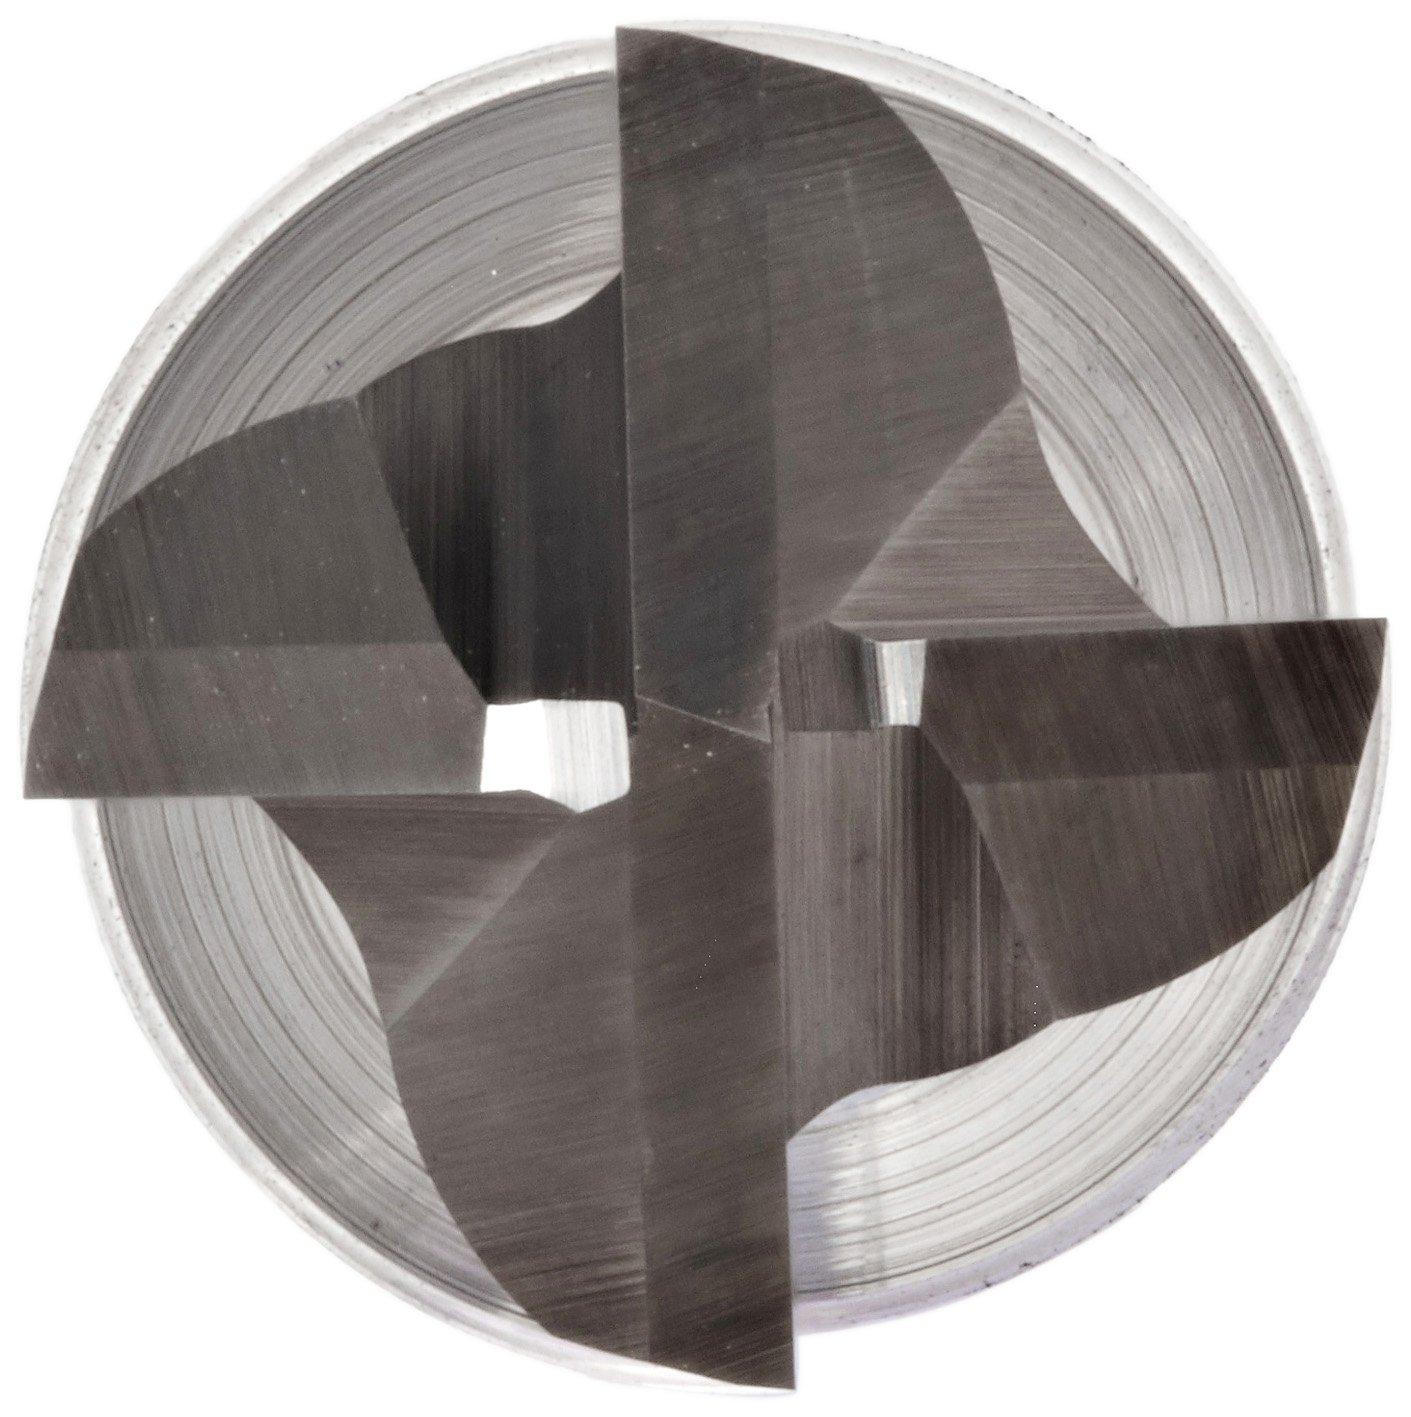 30 Deg Helix 6 Flutes Non-Center Cutting TiCN Monolayer Finish 1.5000 Cutting Diameter 4.5000 Overall Length 1.25 Shank Diameter Melin Tool CRP Cobalt Steel Square Nose End Mill Weldon Shank Roughing Cut